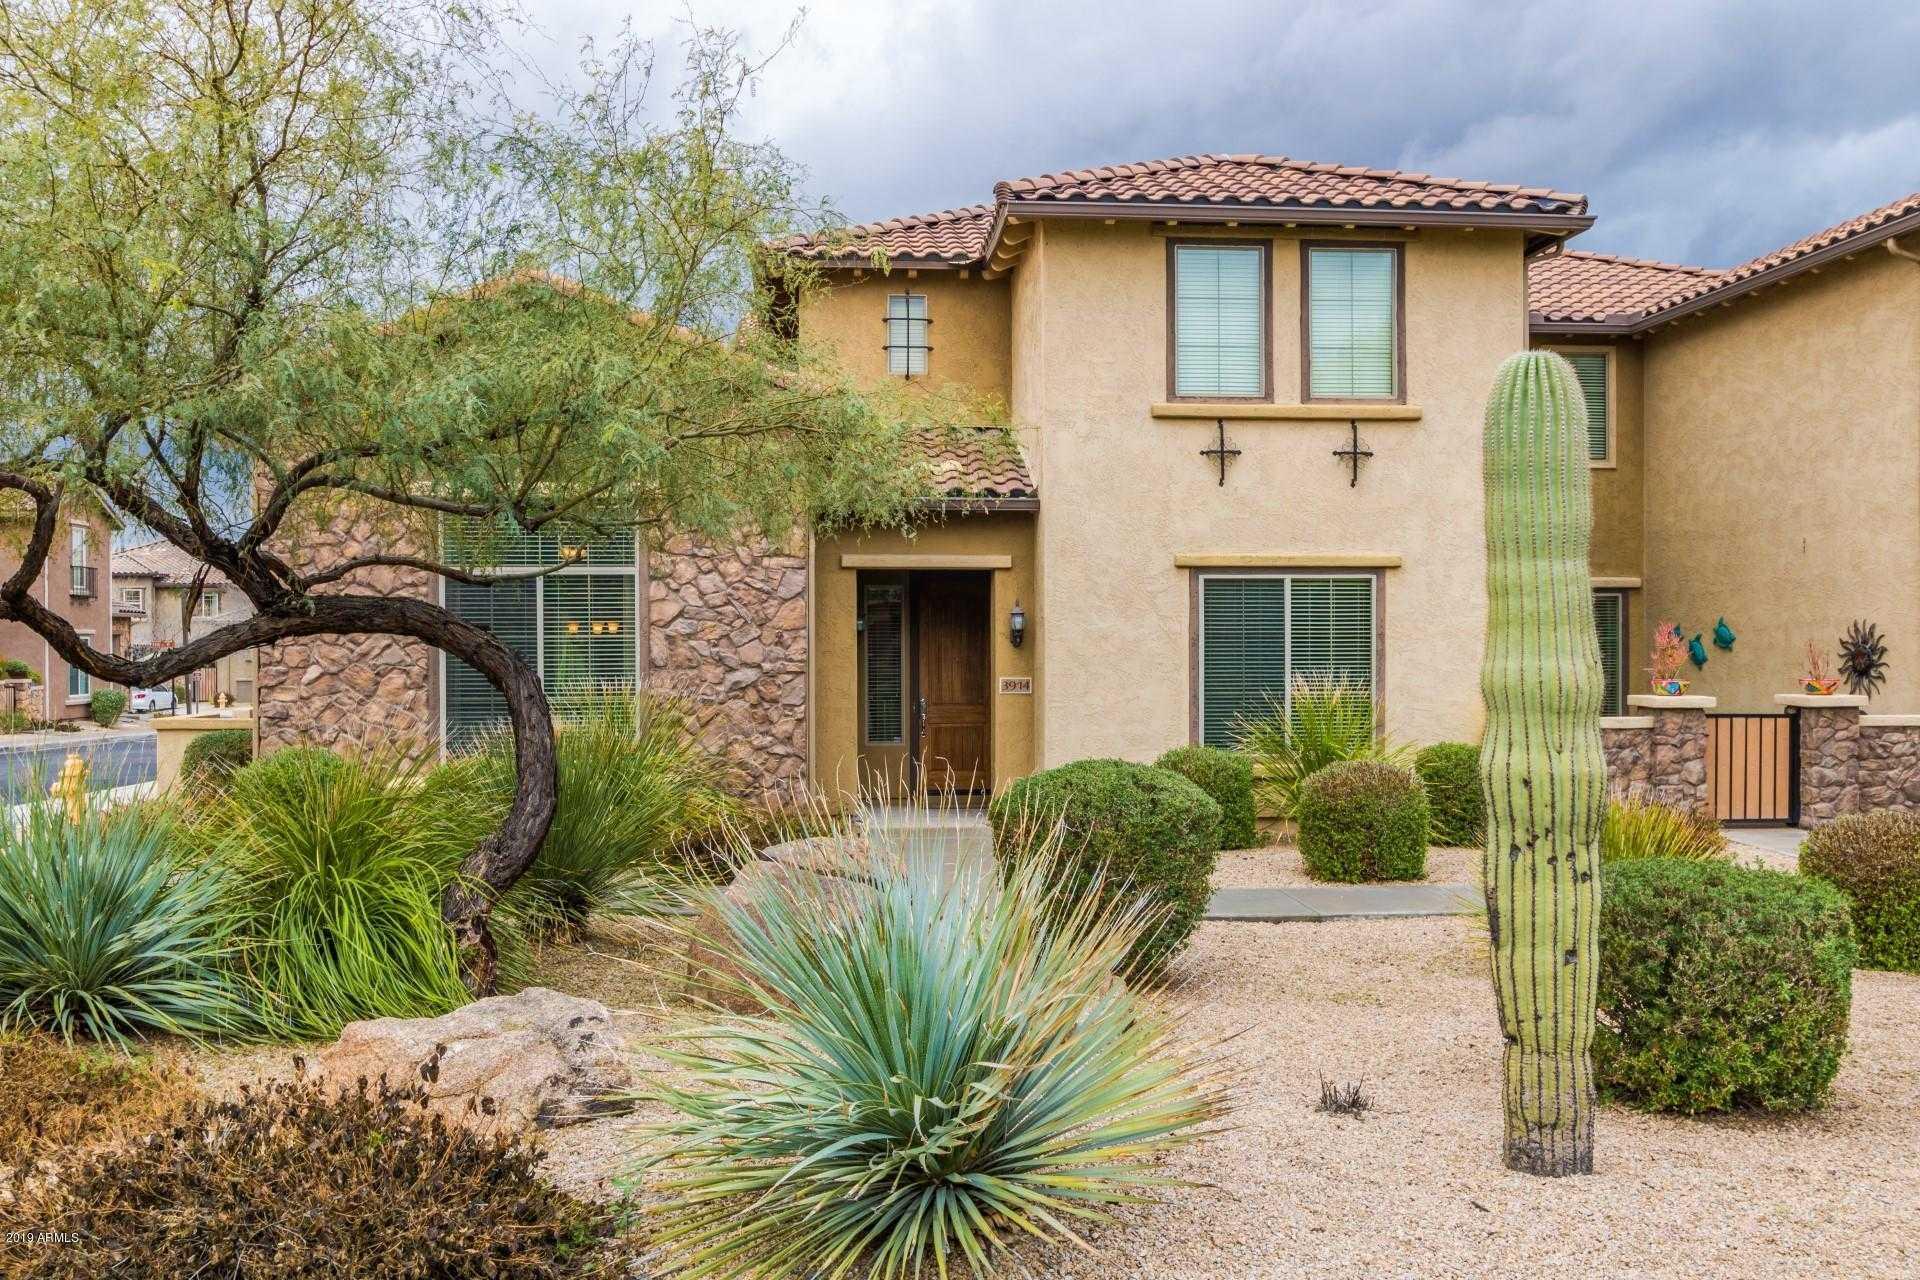 $439,900 - 3Br/3Ba -  for Sale in Fireside At Desert Ridge Triplex Condominiums, Phoenix